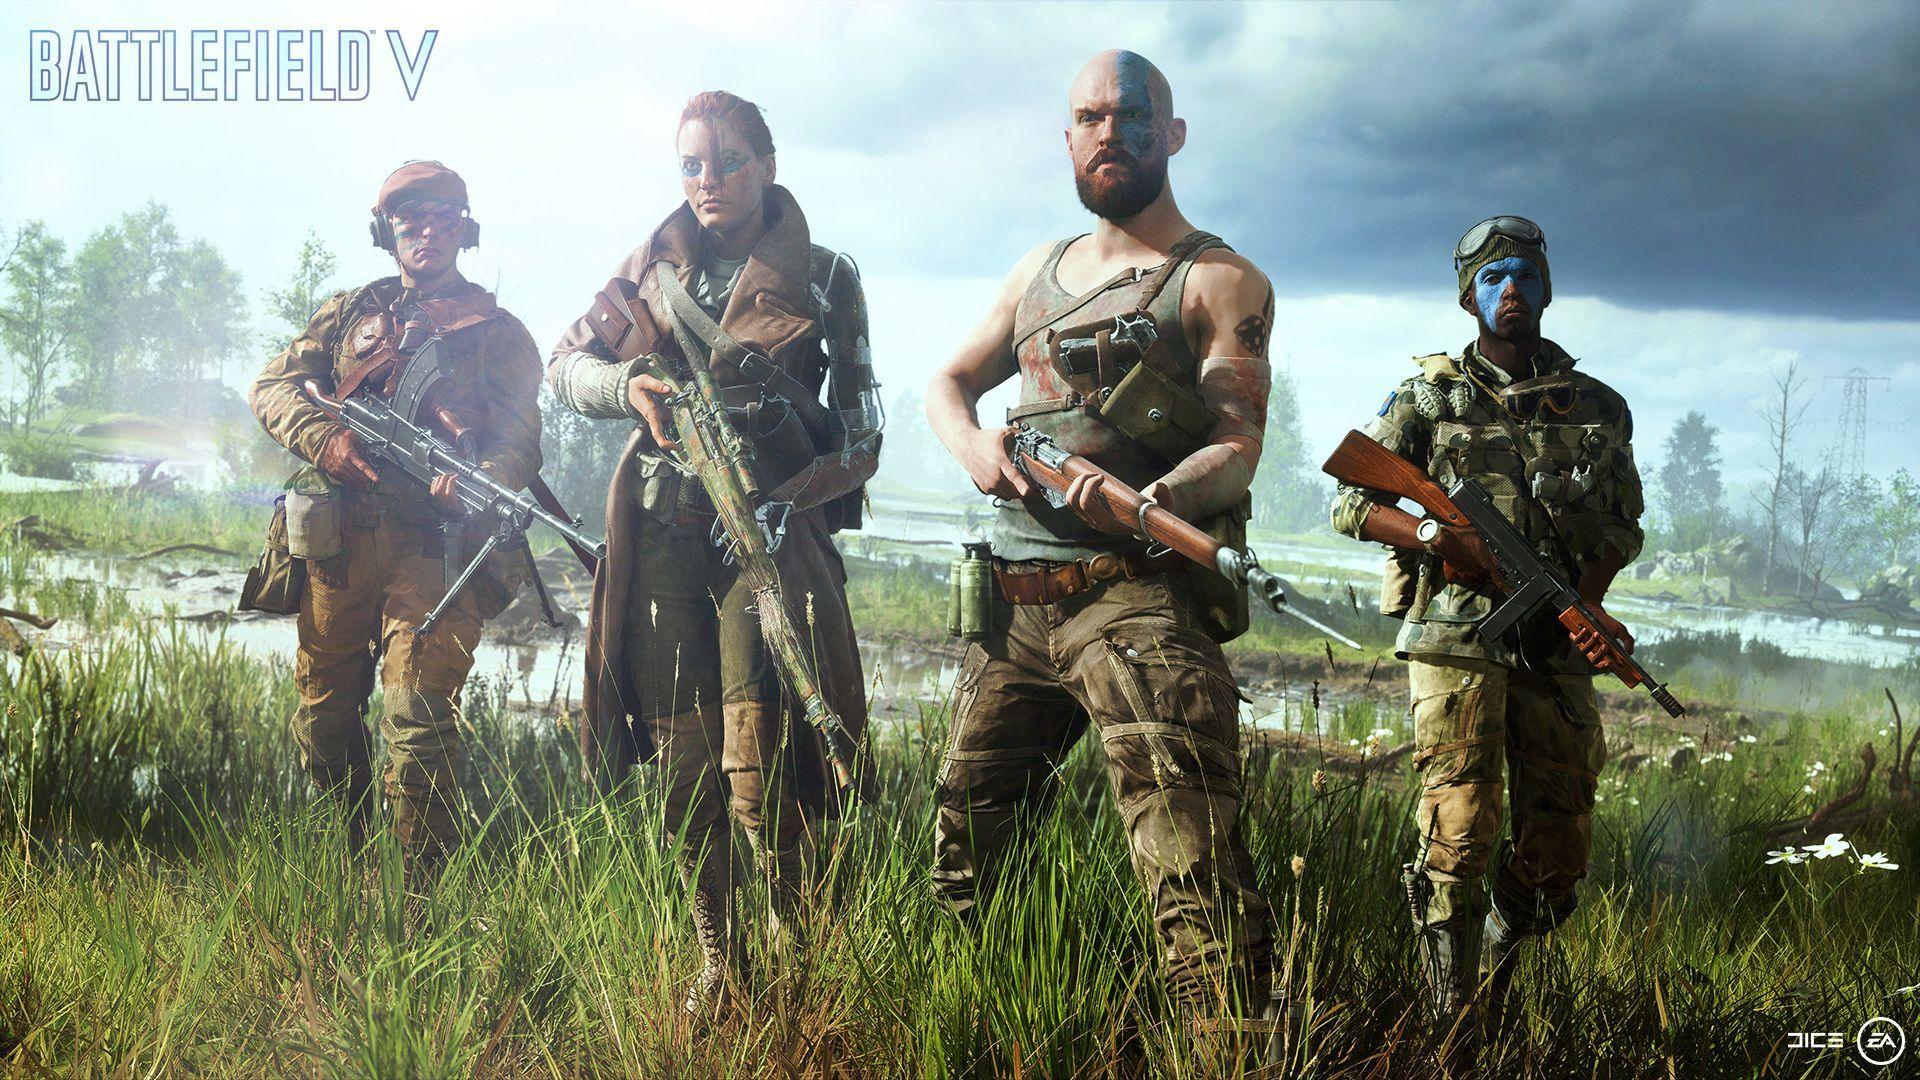 Battlefield V (PC) - 8